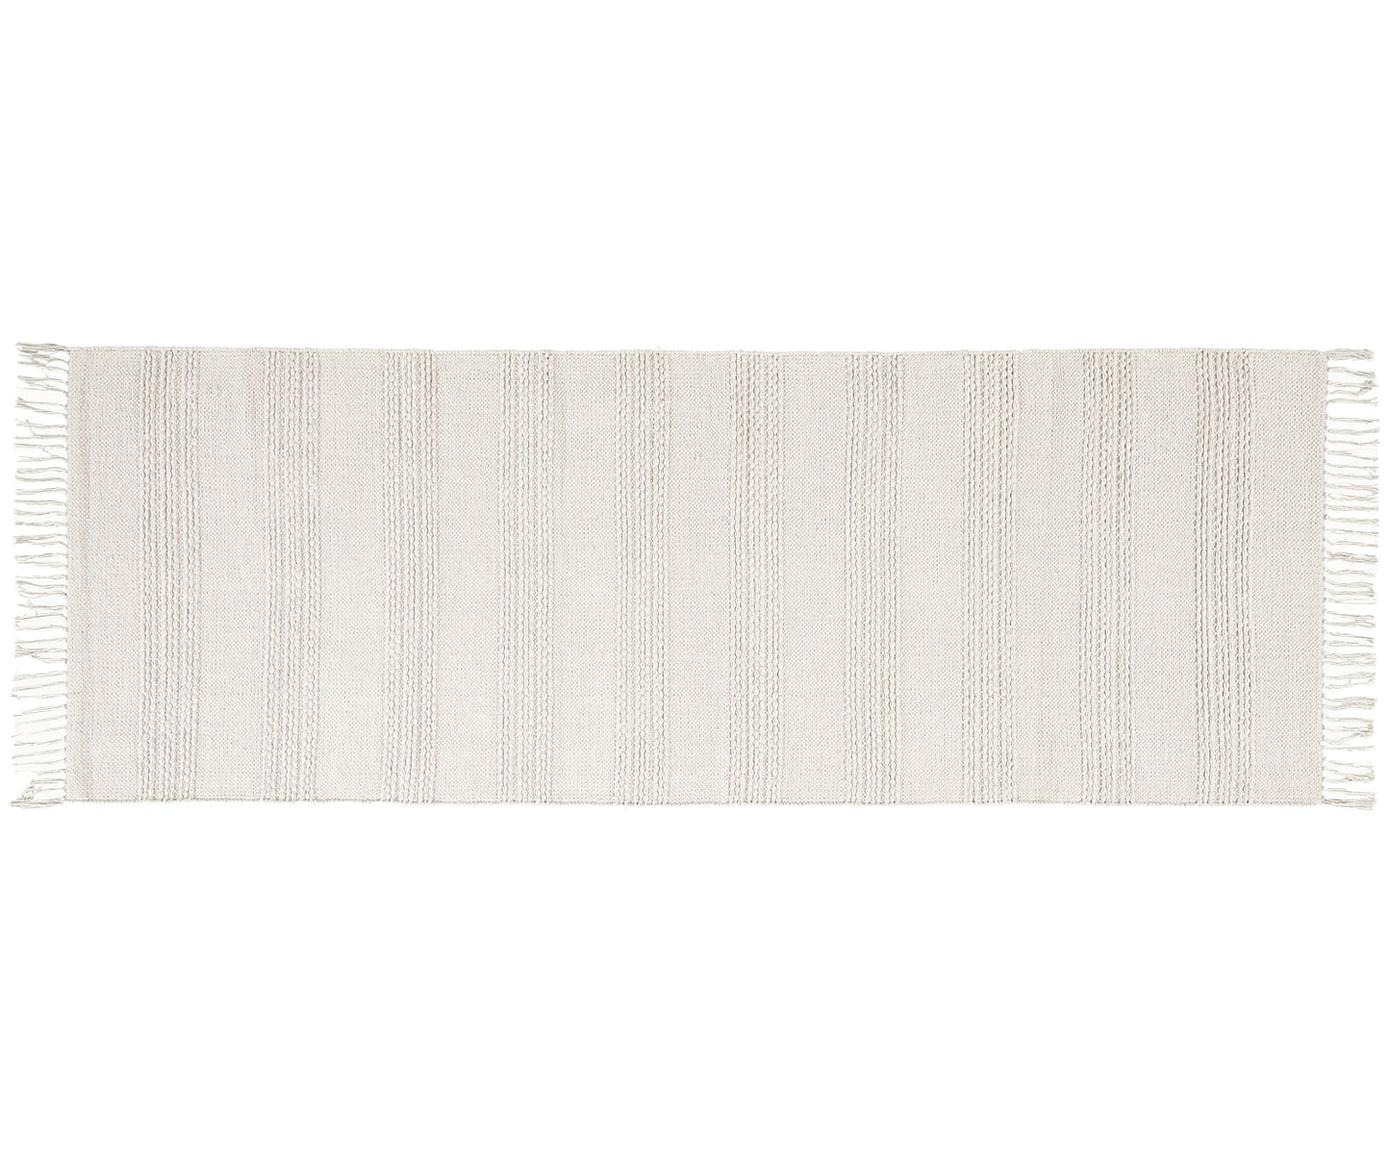 Passatoia Vanya, Cotone, Bianco, Larg. 70 x Lung. 200 cm